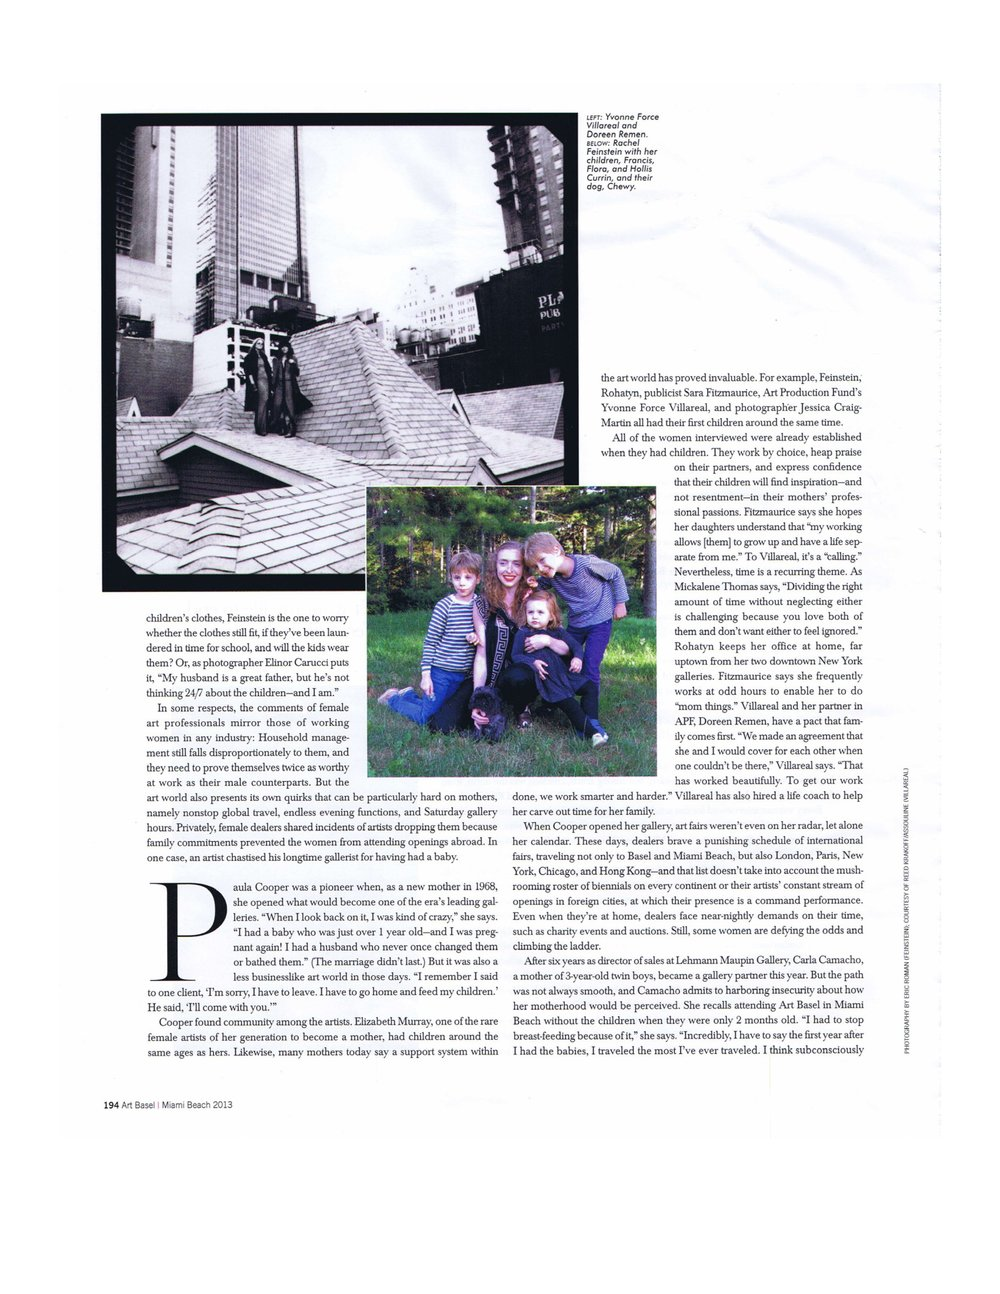 ABMB magazine_Yvonne_December 2013 3.jpeg